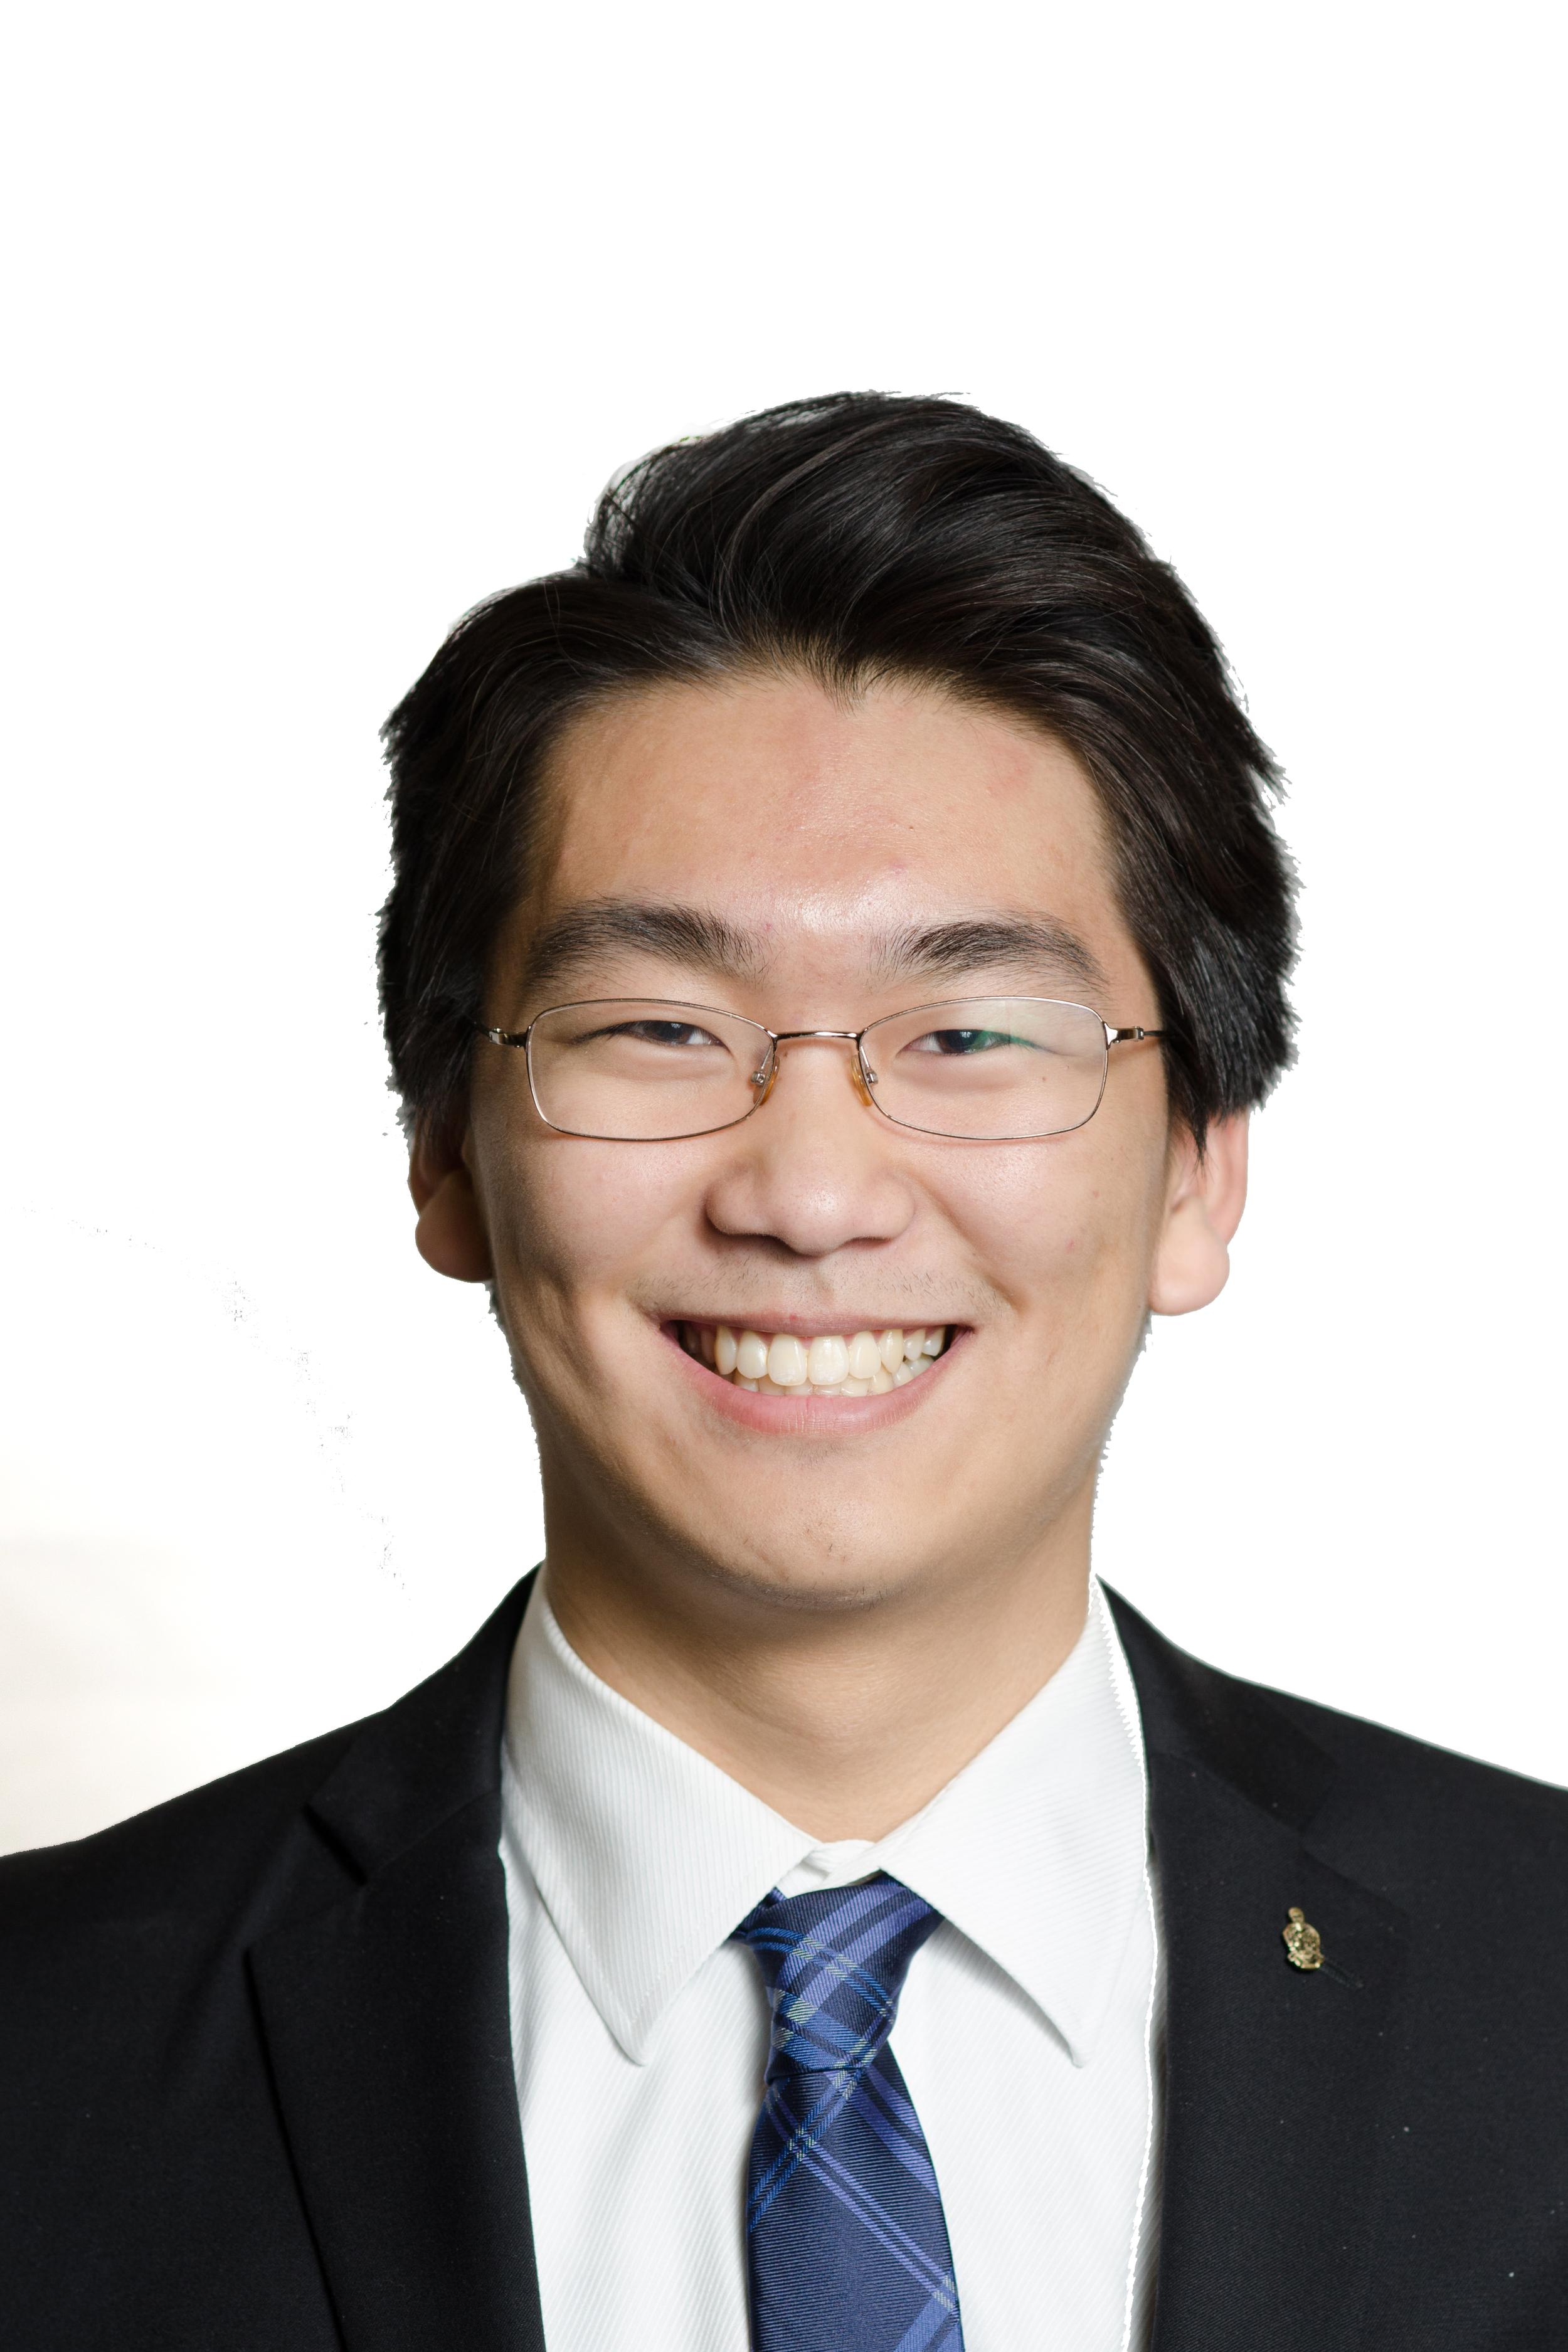 Sam Jung